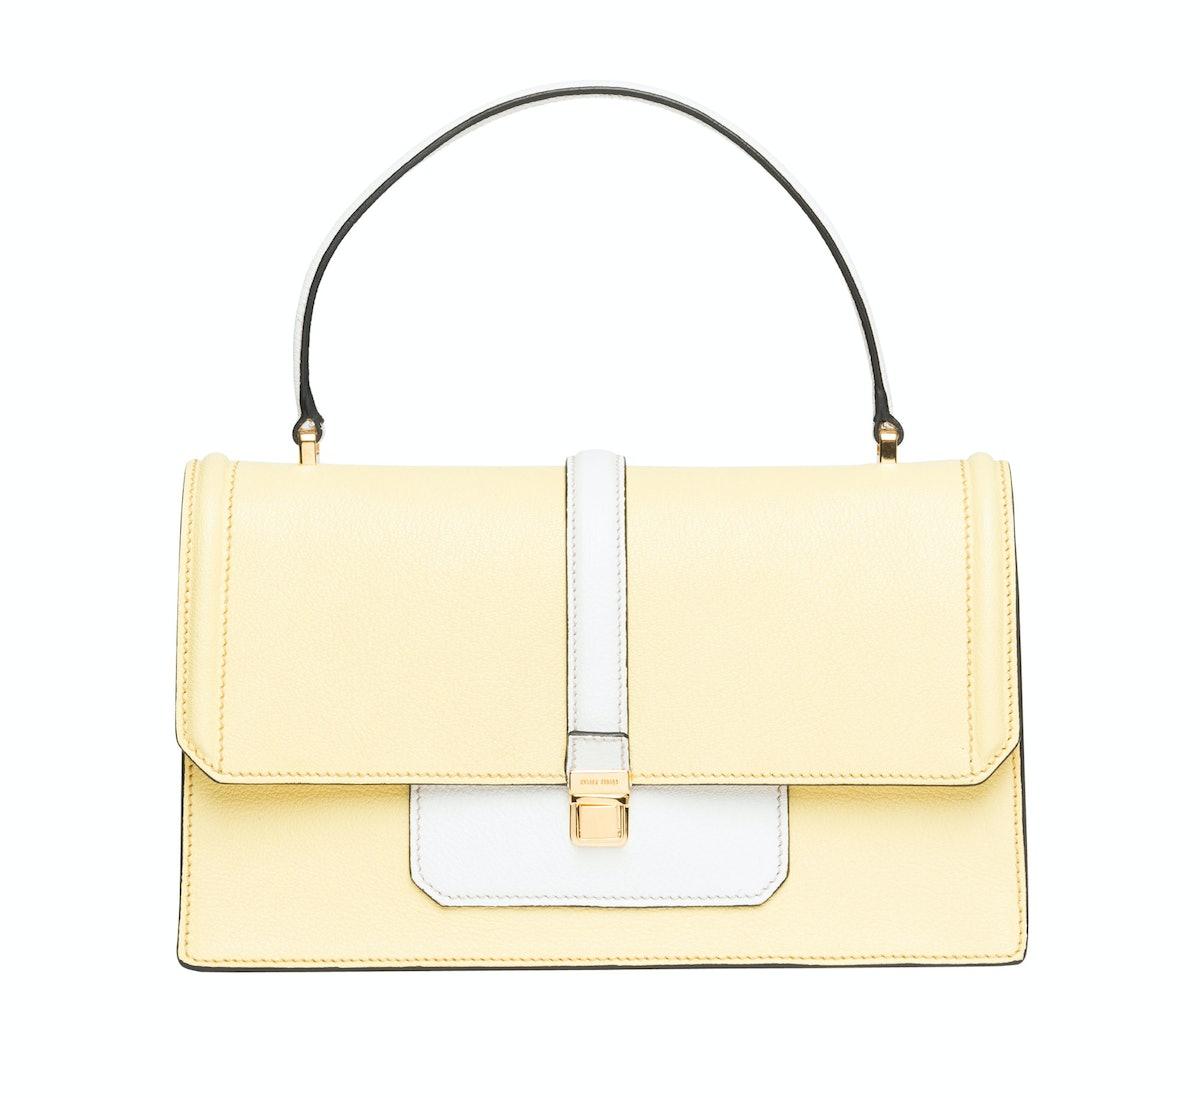 Miu Miu Pastel Bag